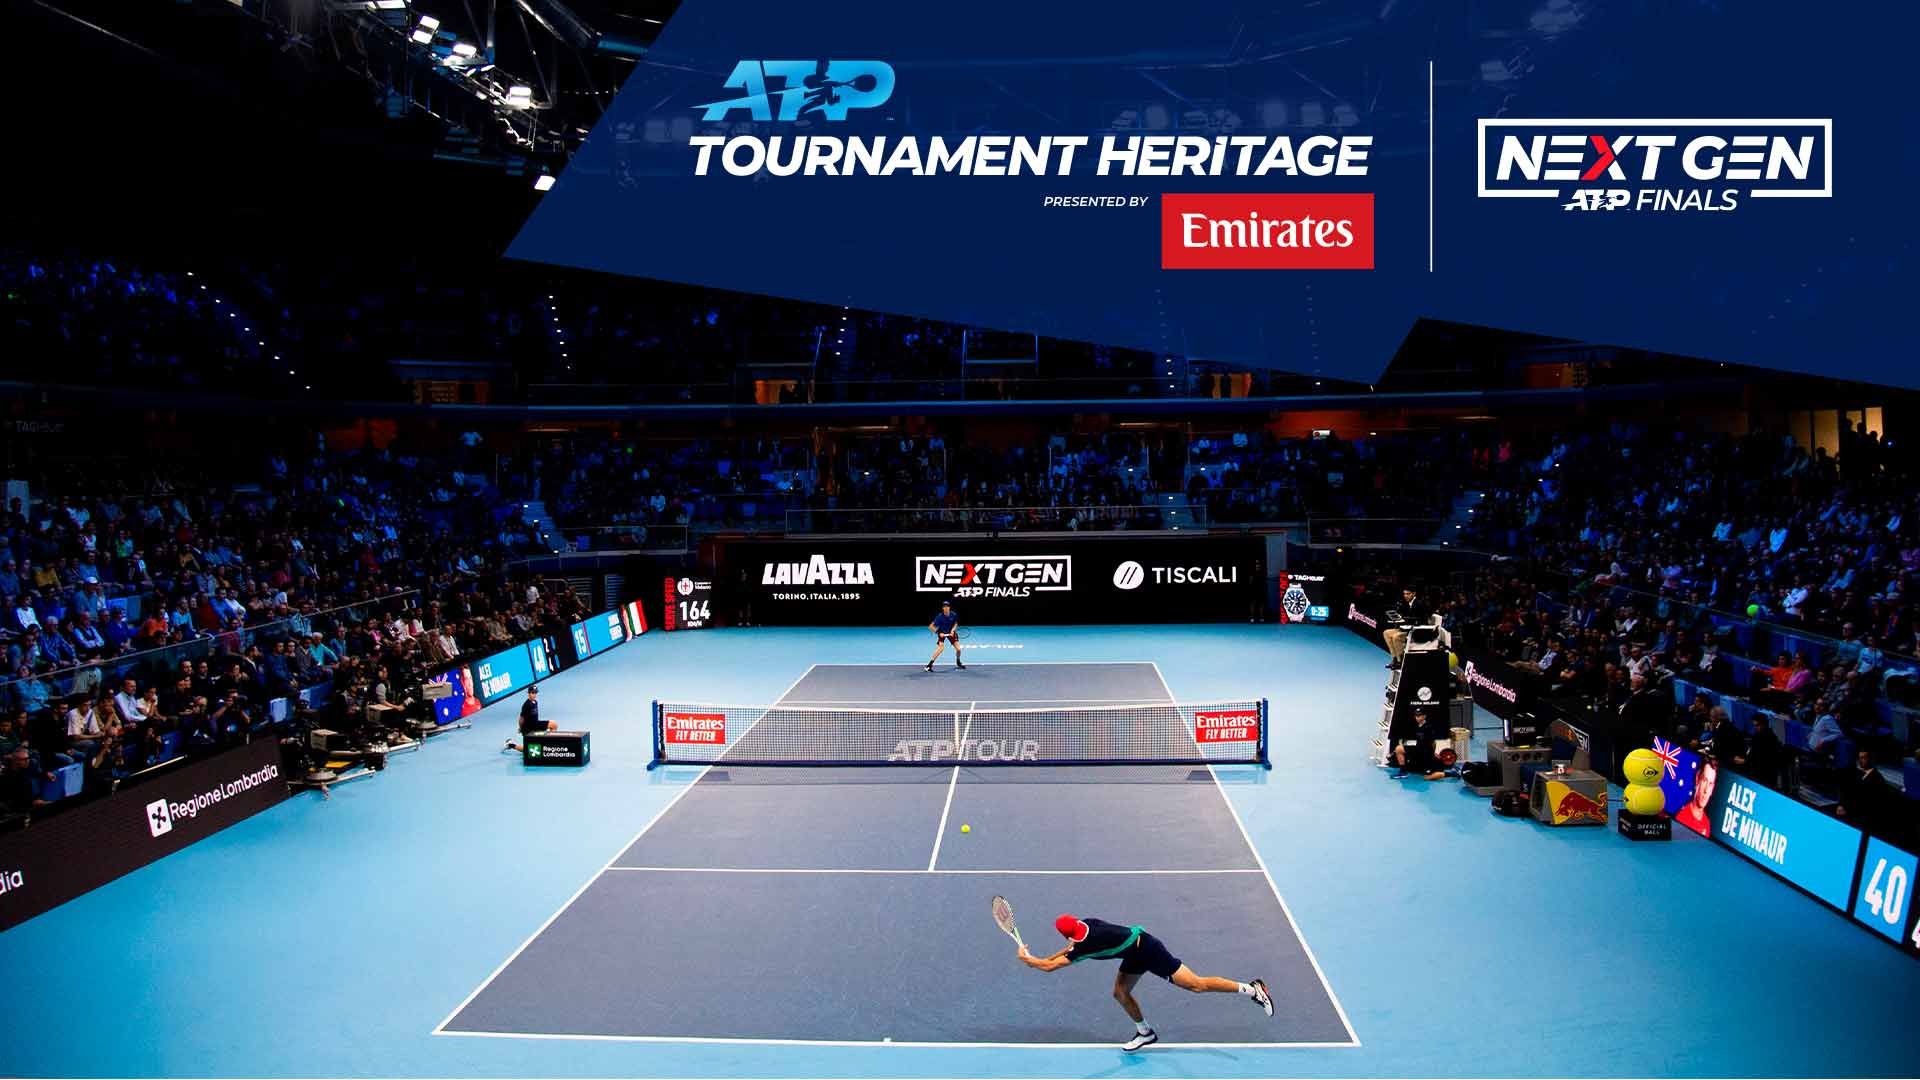 Next Gen Atp Finals Where Future Stars Take Centre Stage Atp Tour Tennis